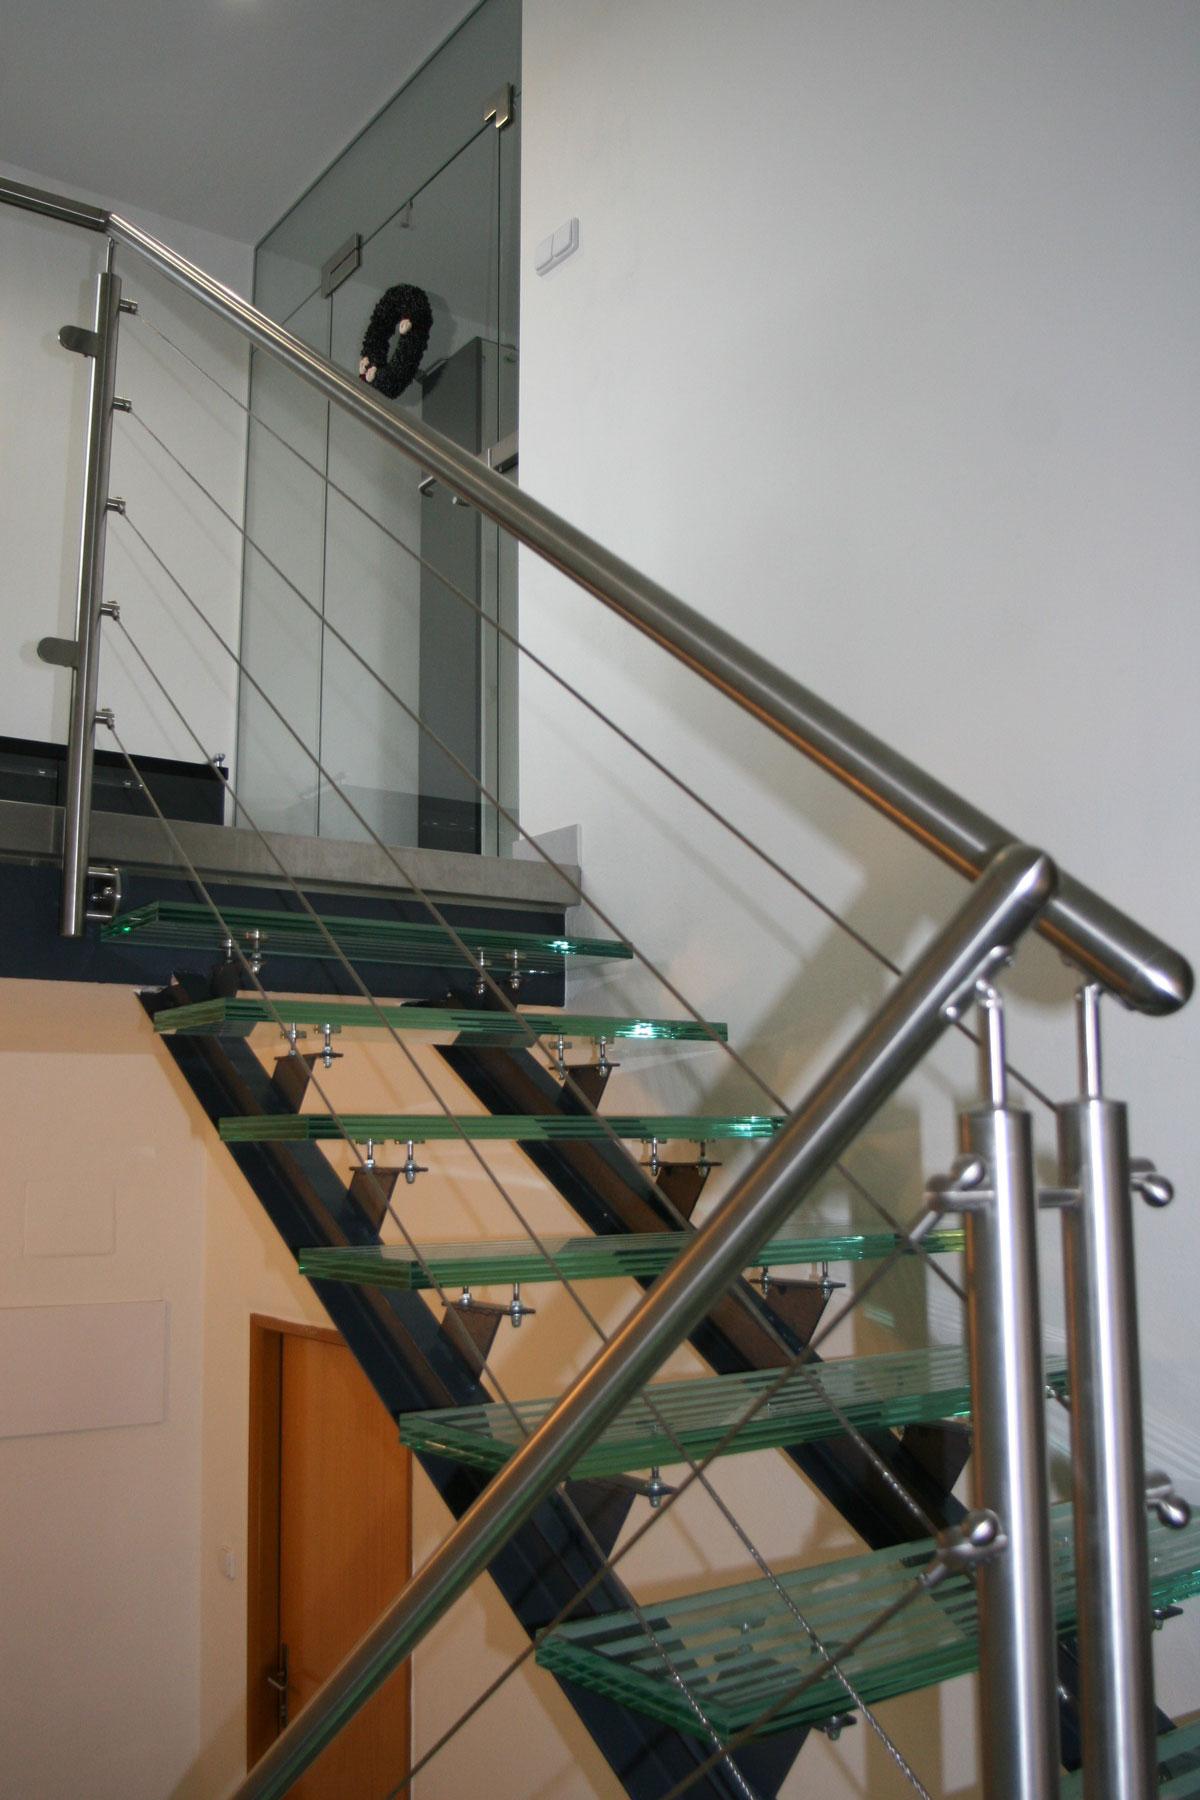 Sklenarstvi-Prerost-schody-a- pochozi-sklo (19)